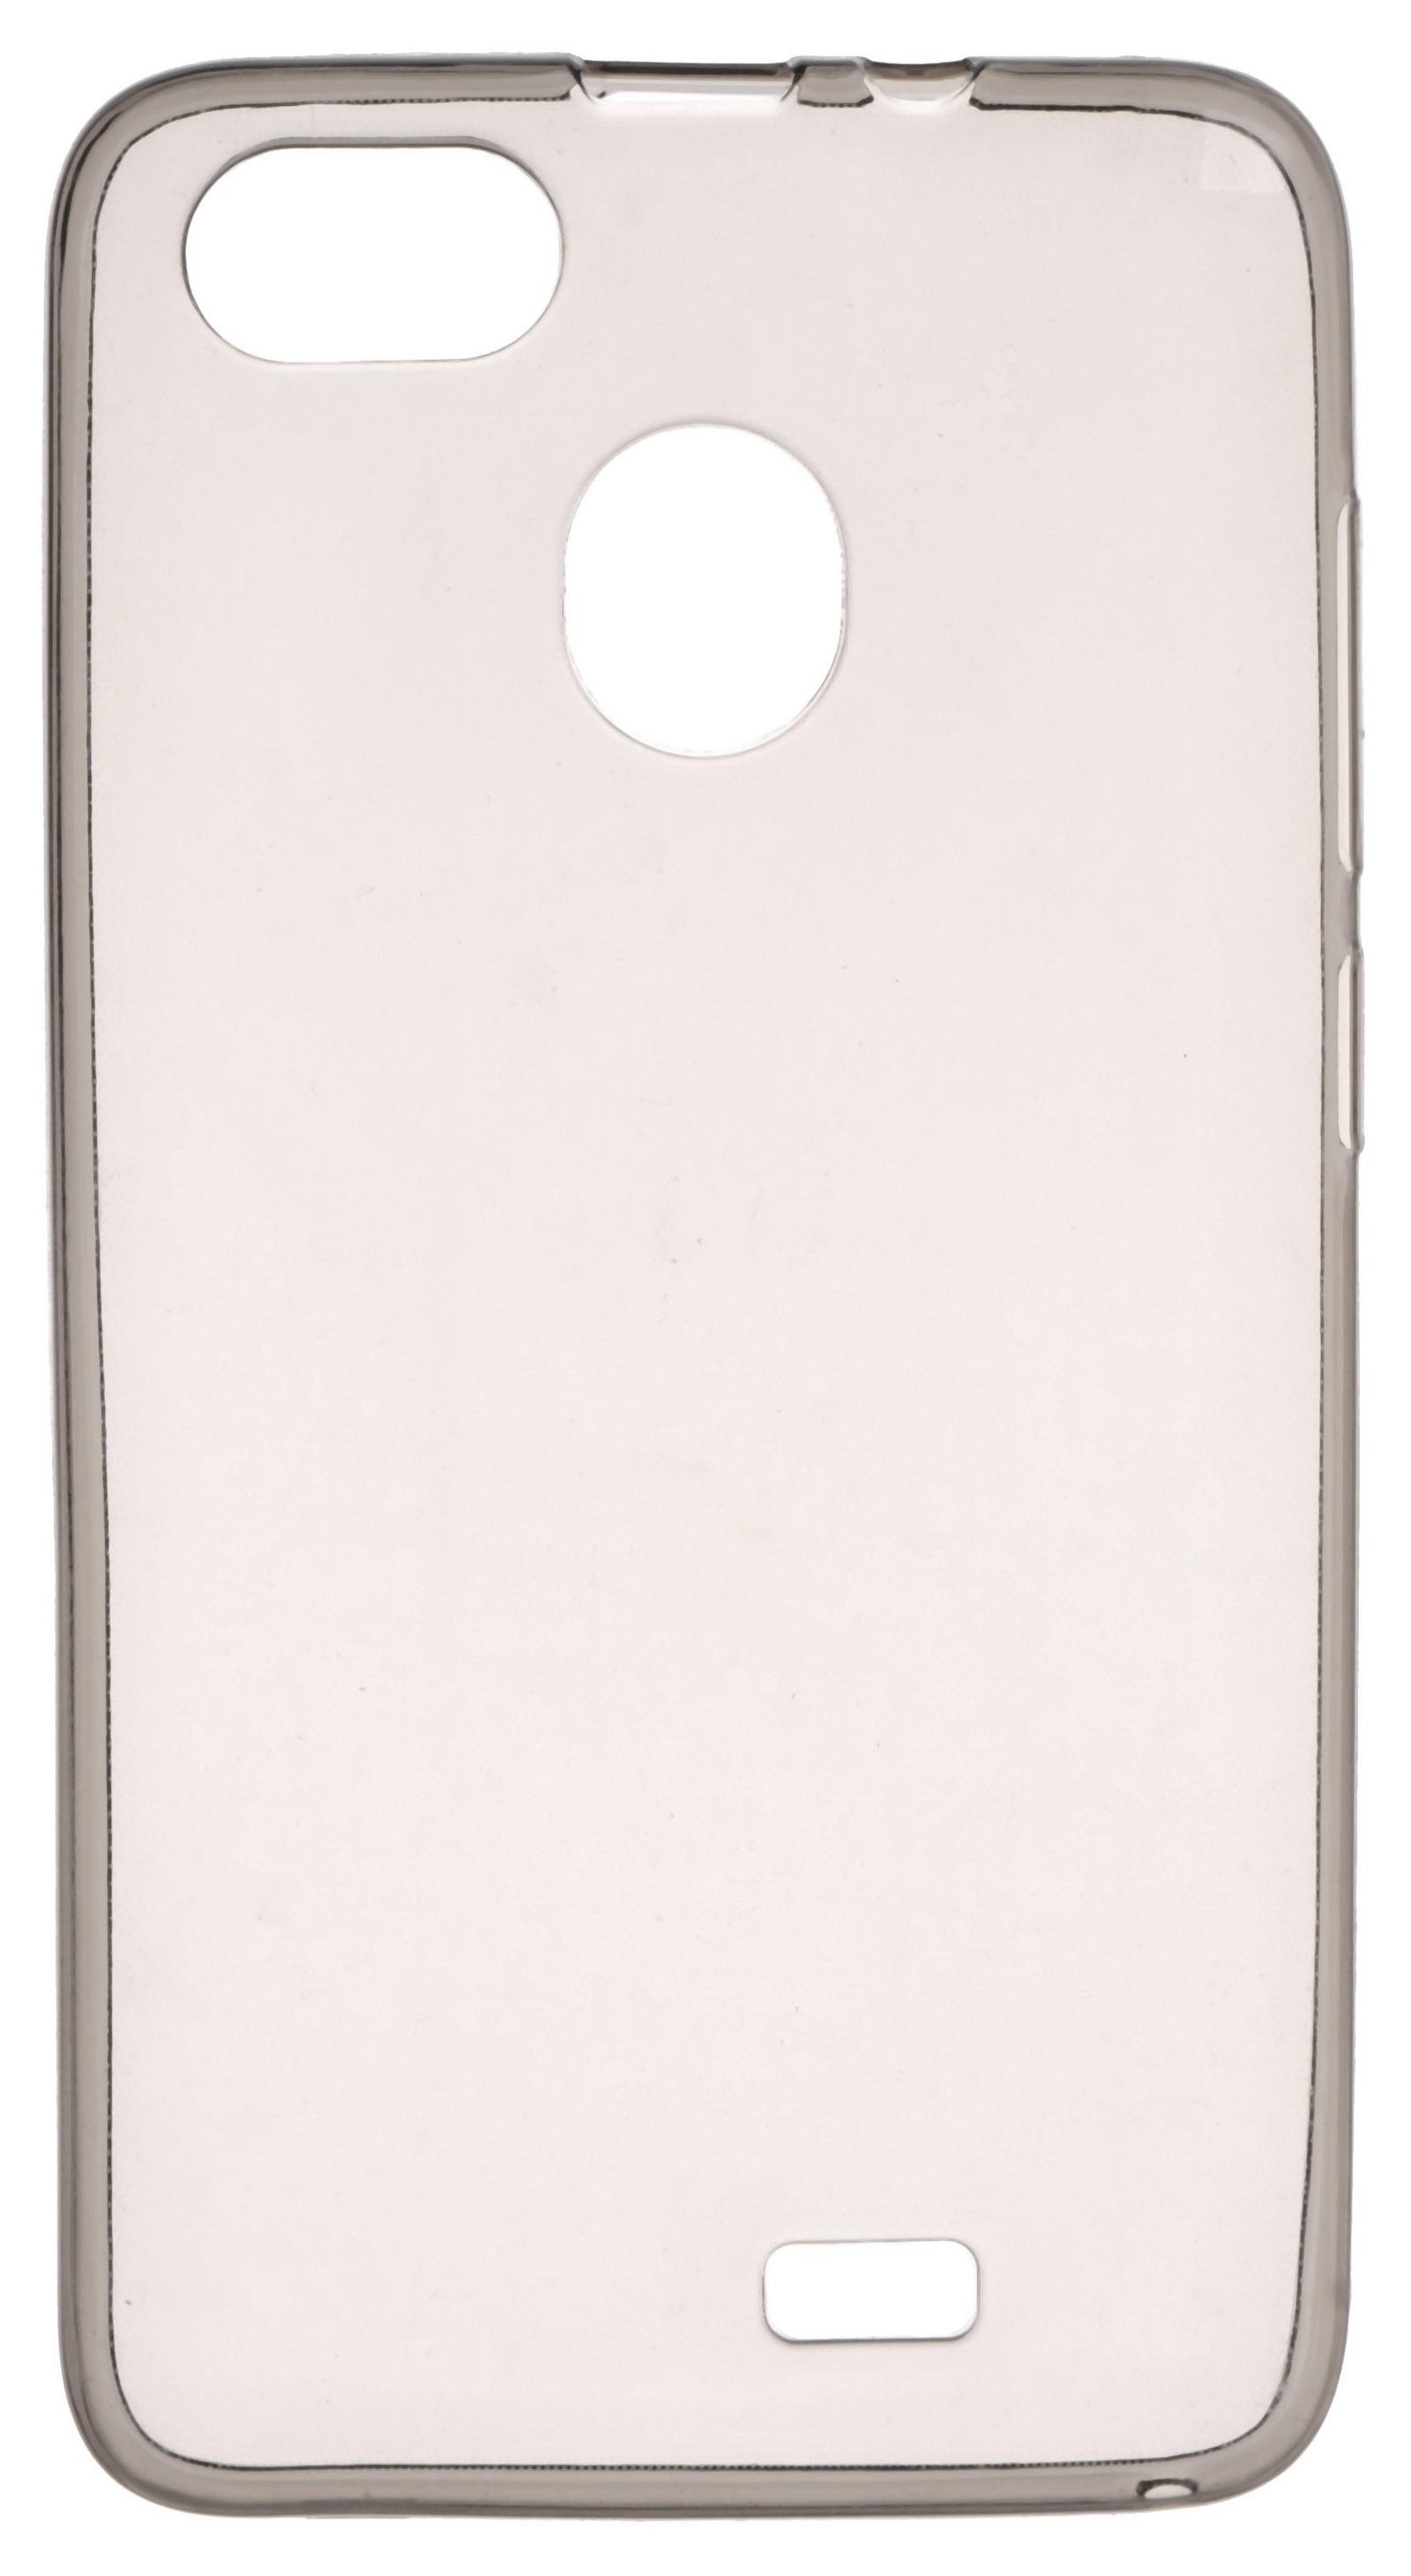 Чехол для сотового телефона skinBOX Slim Silicone, 4630042521643, серый цена и фото